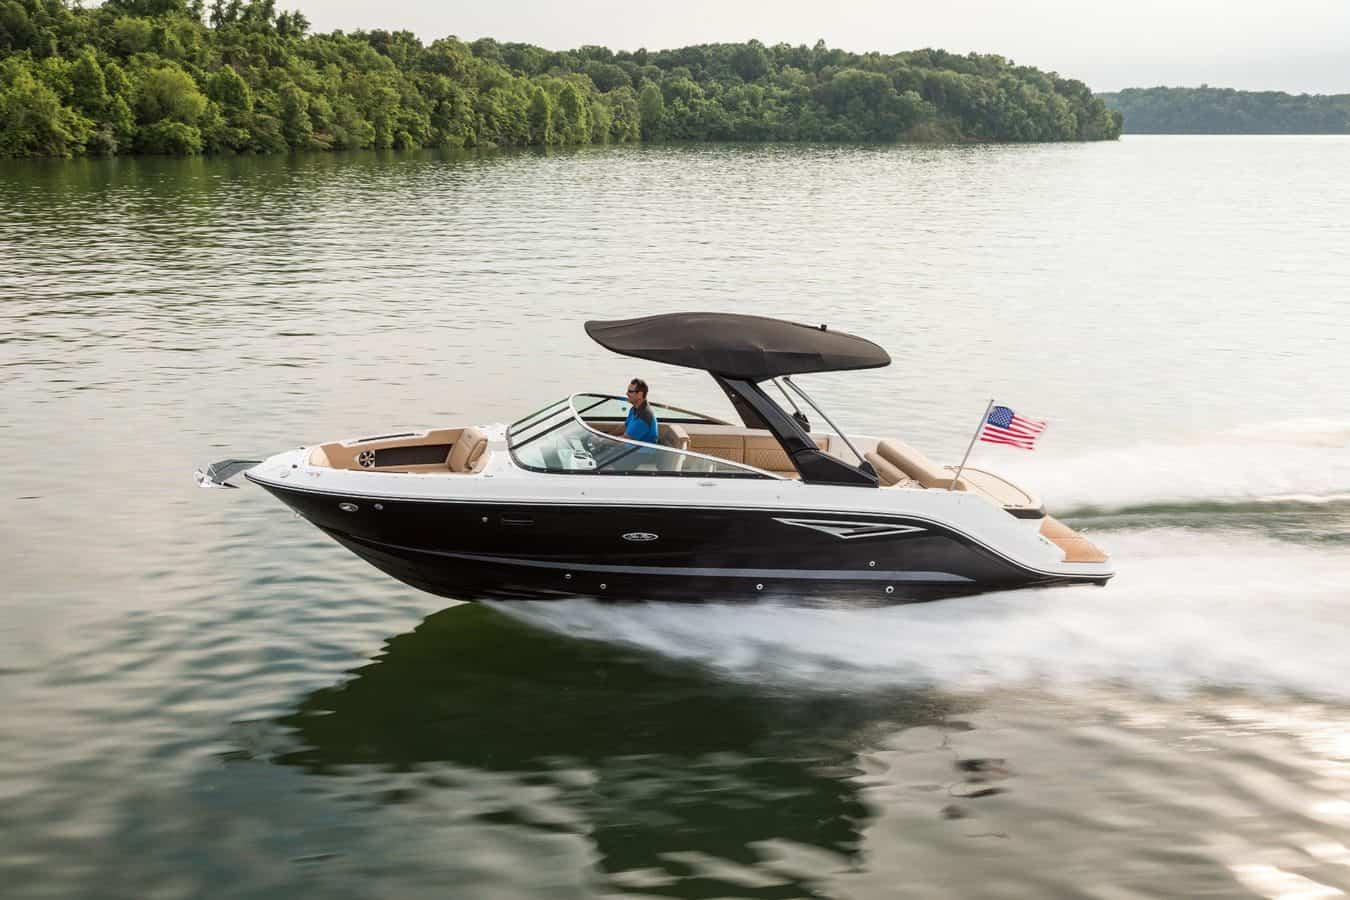 NEW 2021 Sea Ray 280 SLX - Hutchinson's Boat Works